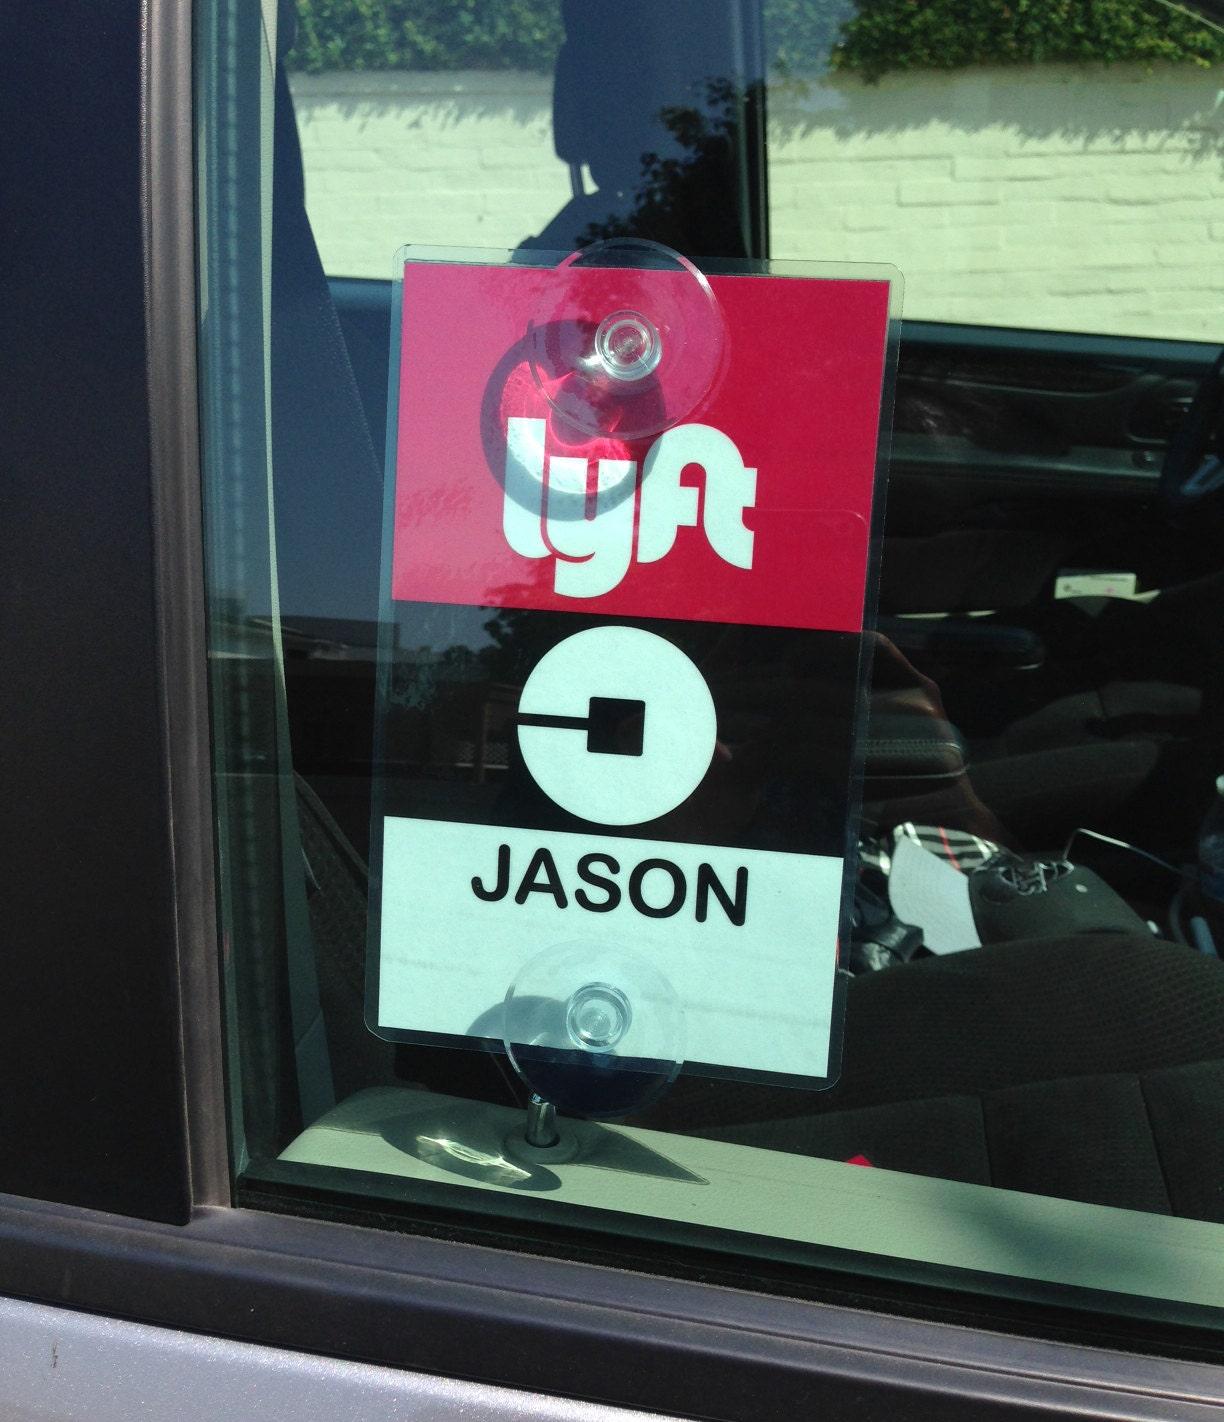 uber lyft decal sign rideshare car display cards by alvinsiki. Black Bedroom Furniture Sets. Home Design Ideas